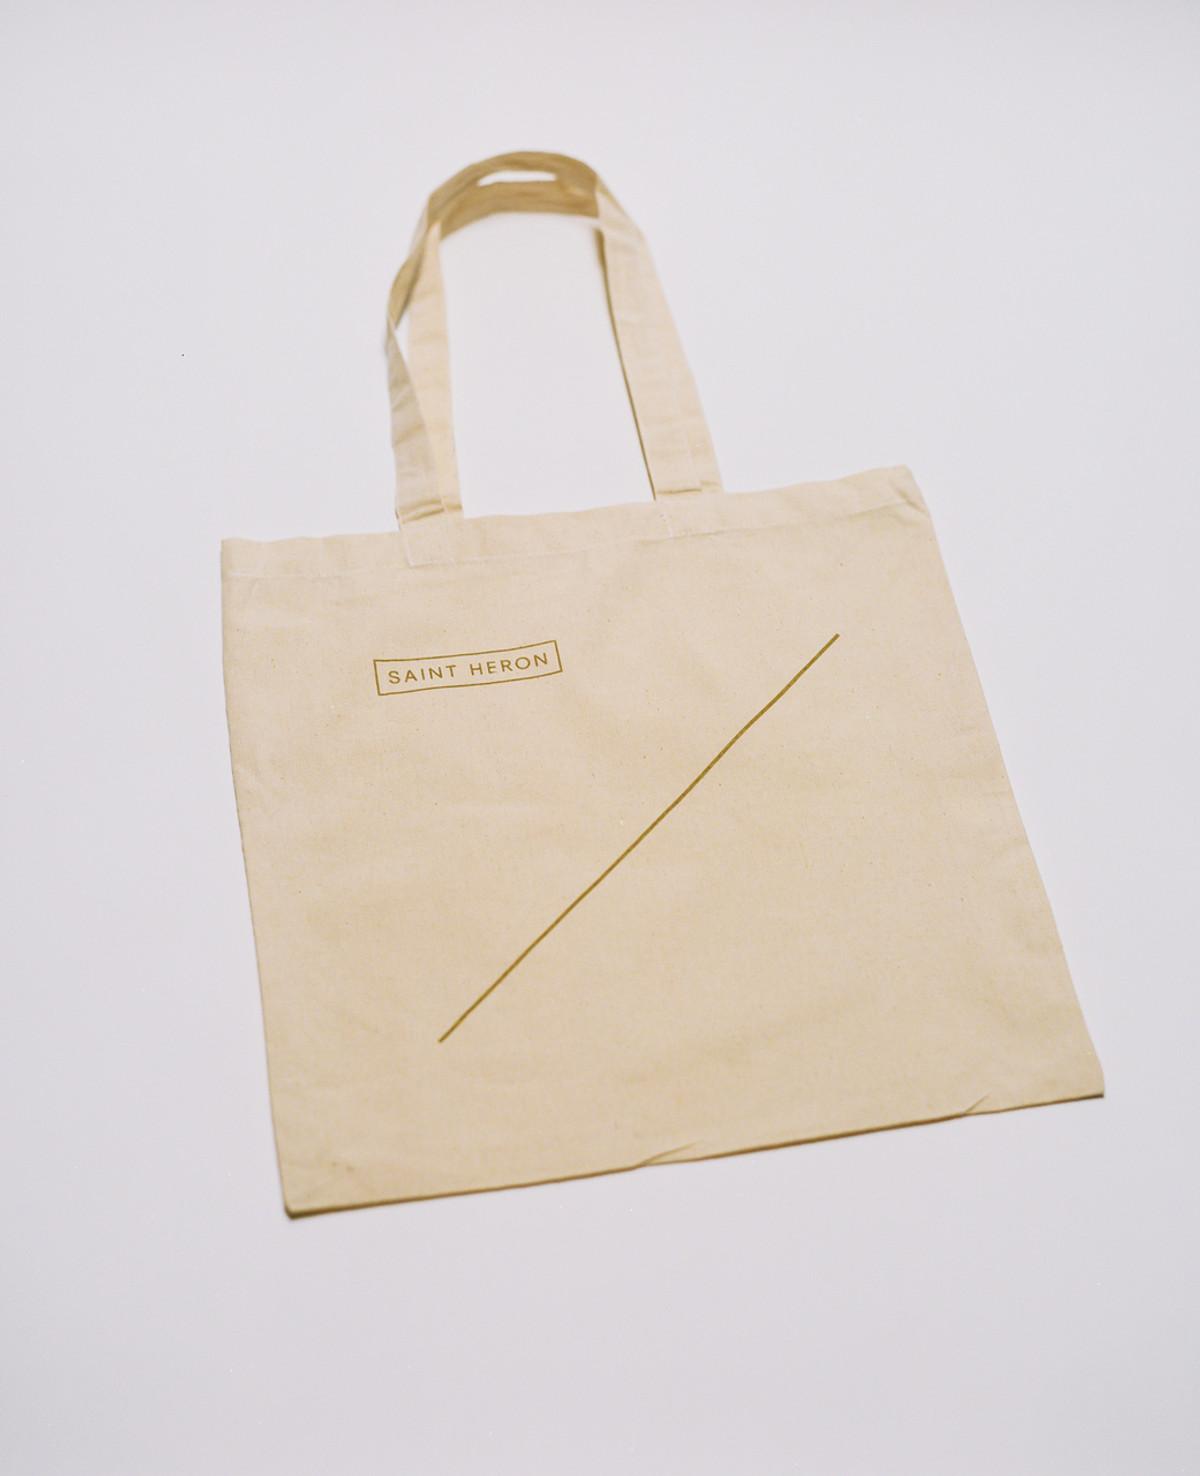 Saint Heron Tote Bag - Golden Line